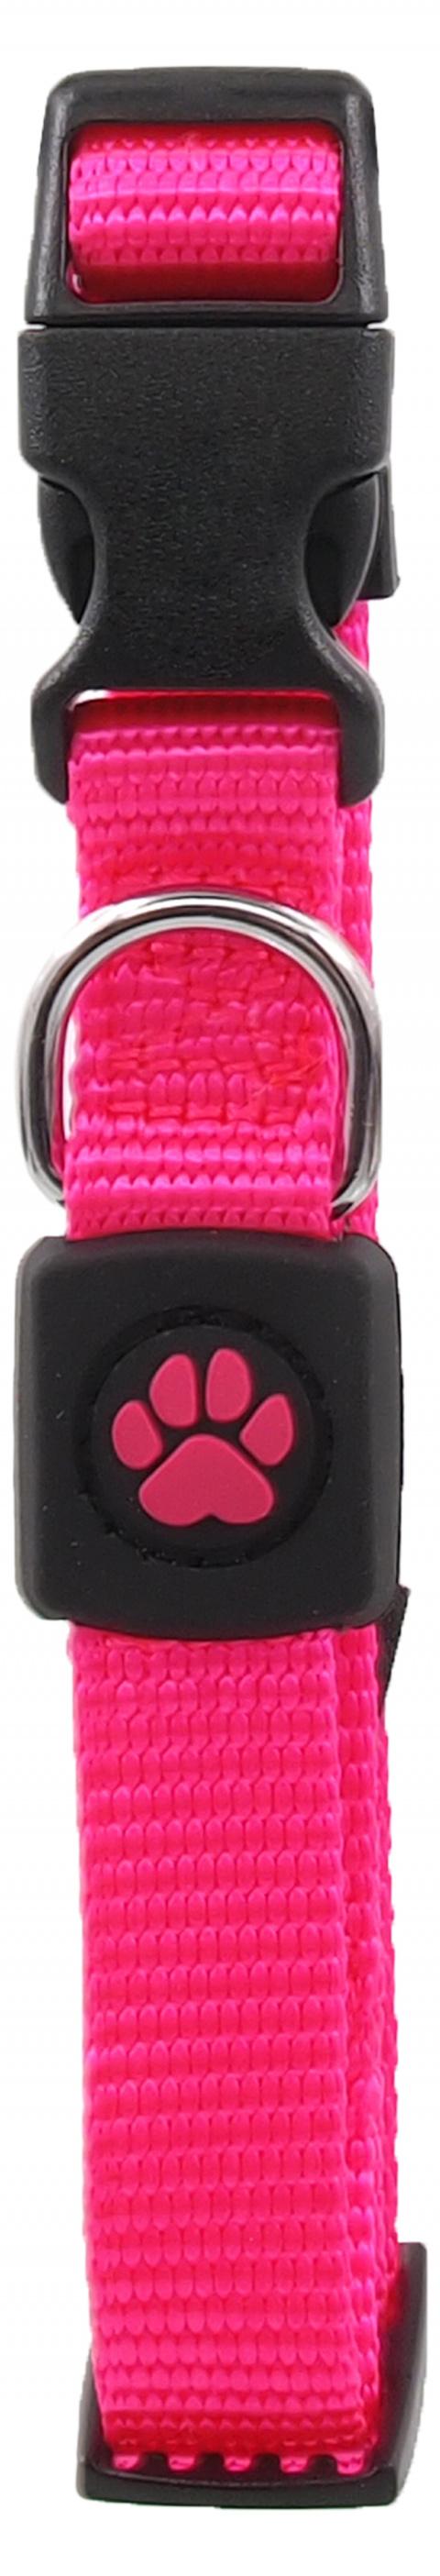 Obojek Active Dog Premium S růžový 1,5x27-37cm title=